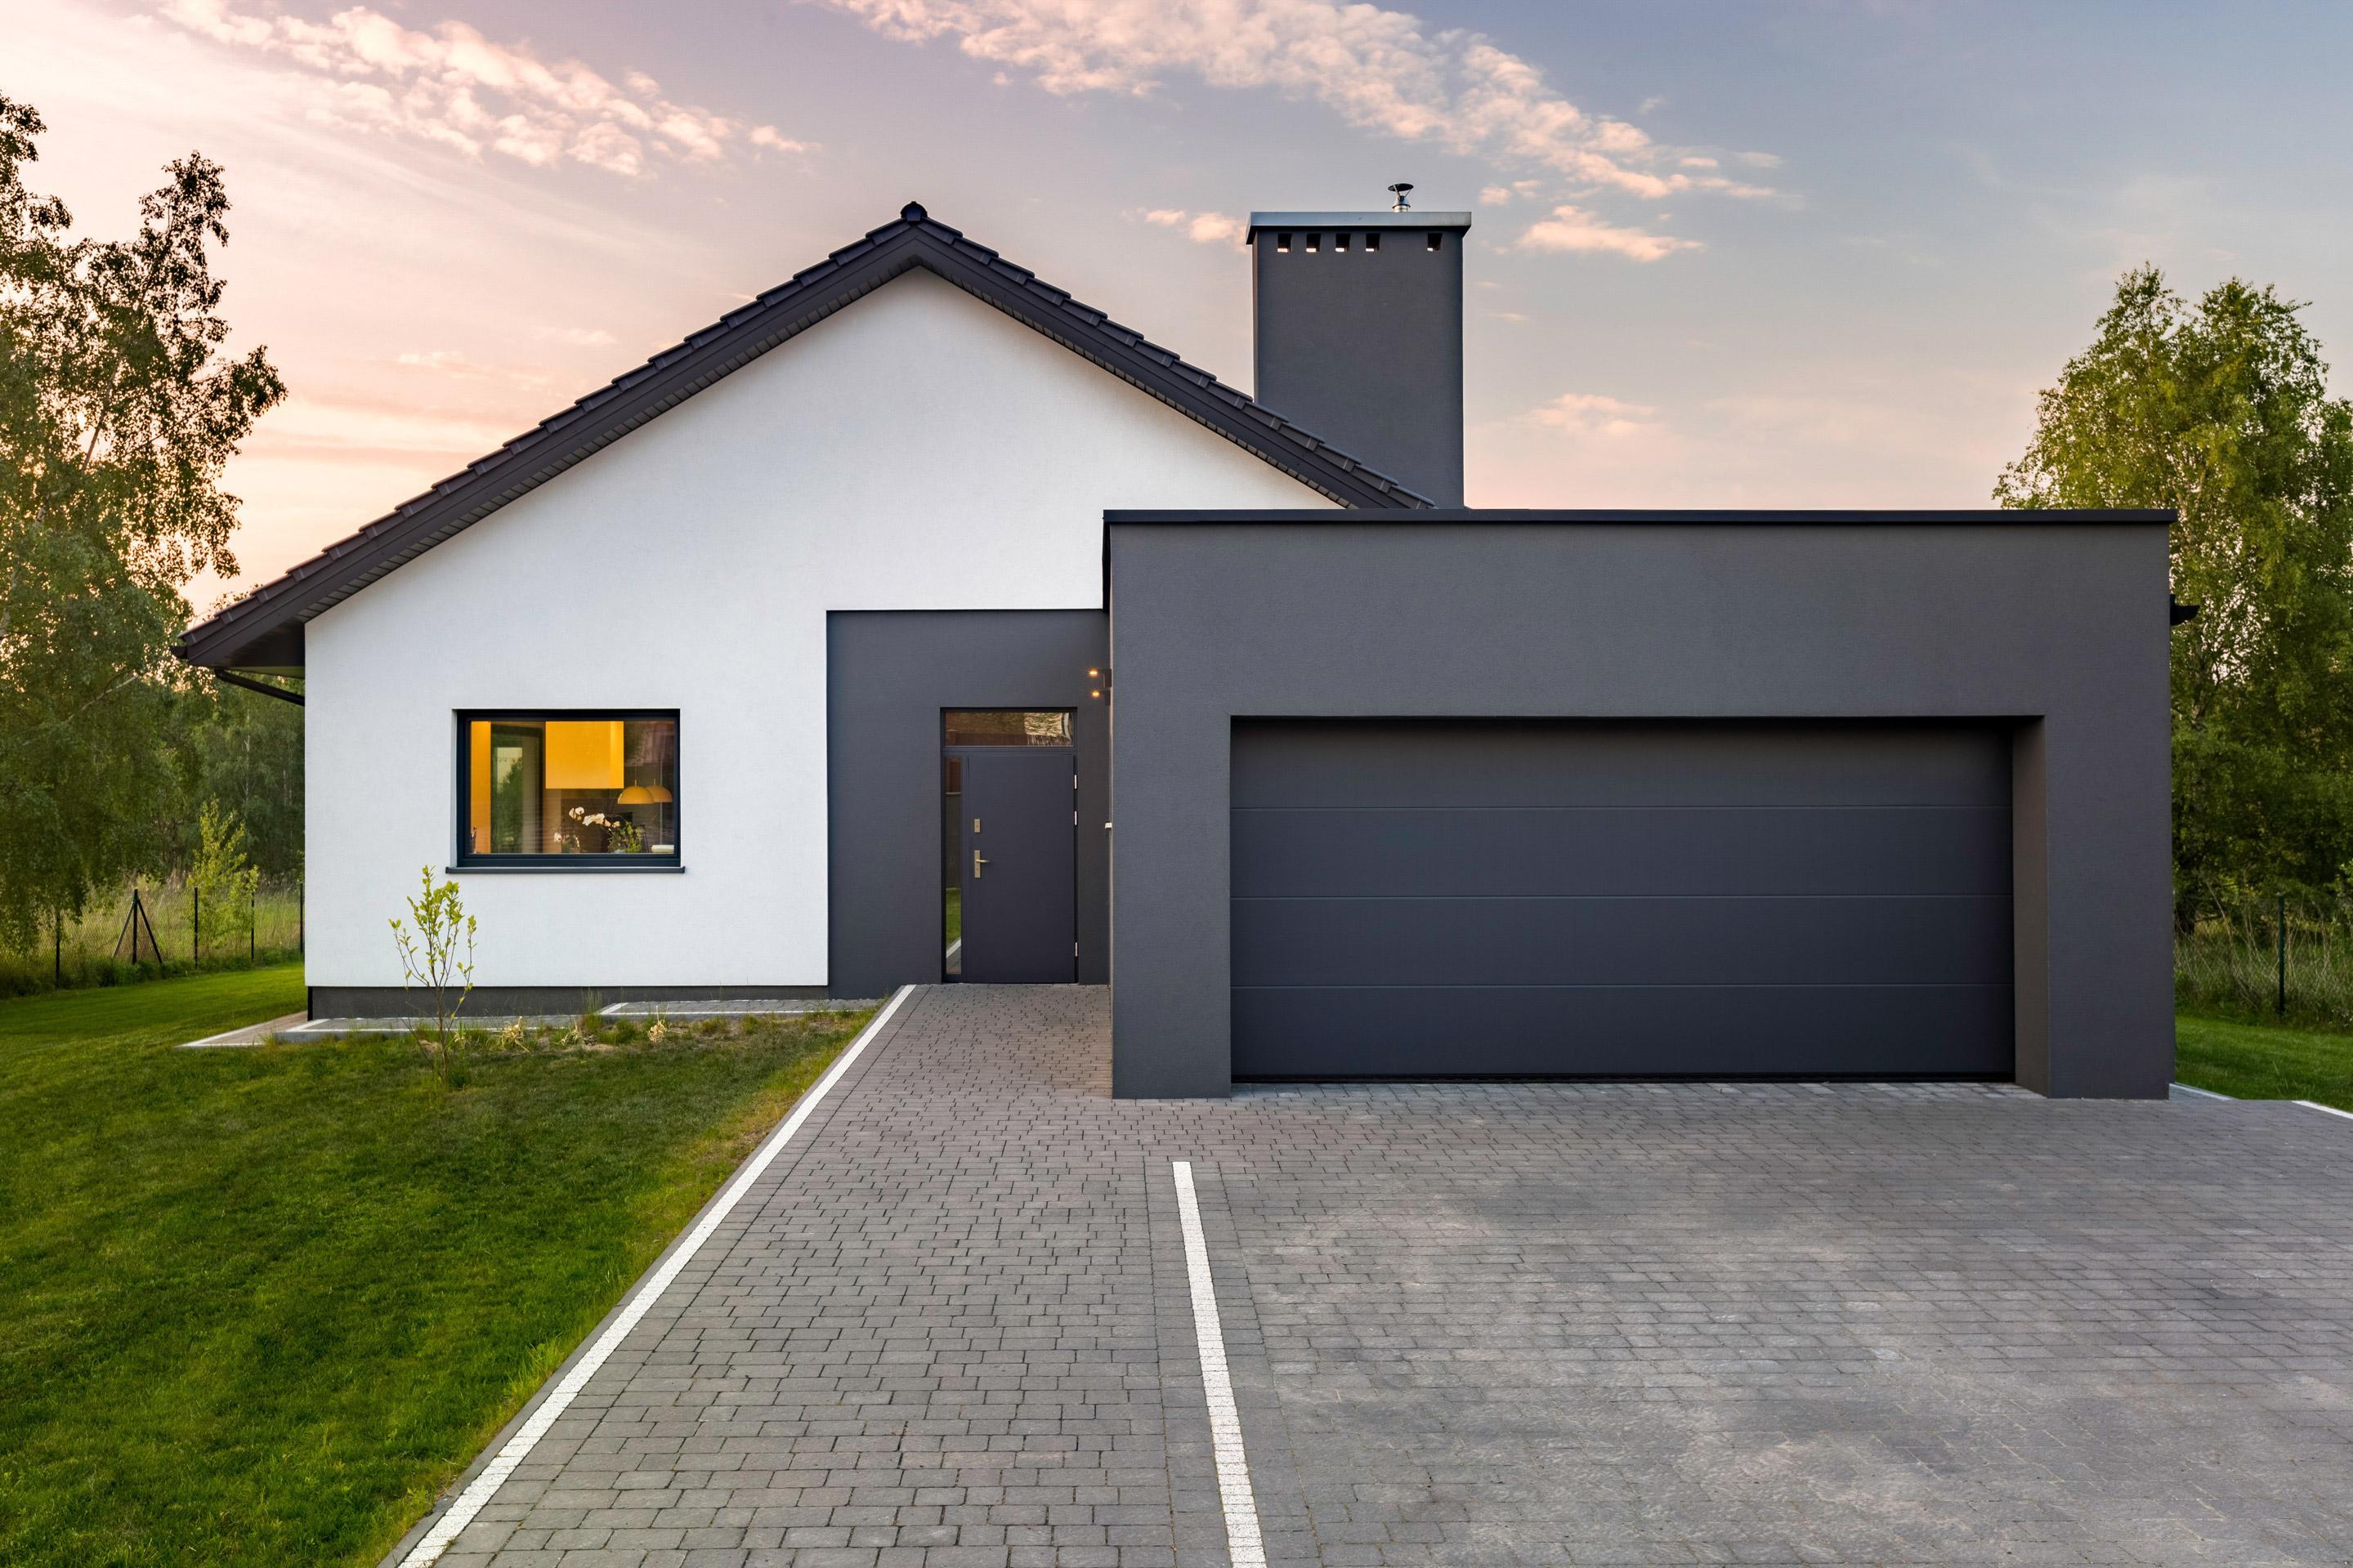 Porte De Garage Sectionnelle Motorisee Artens Premium 212 5x300 Gris Anthracite En 2020 Portes De Garage Moderne Maison Moderne Toit Plat Garage Moderne